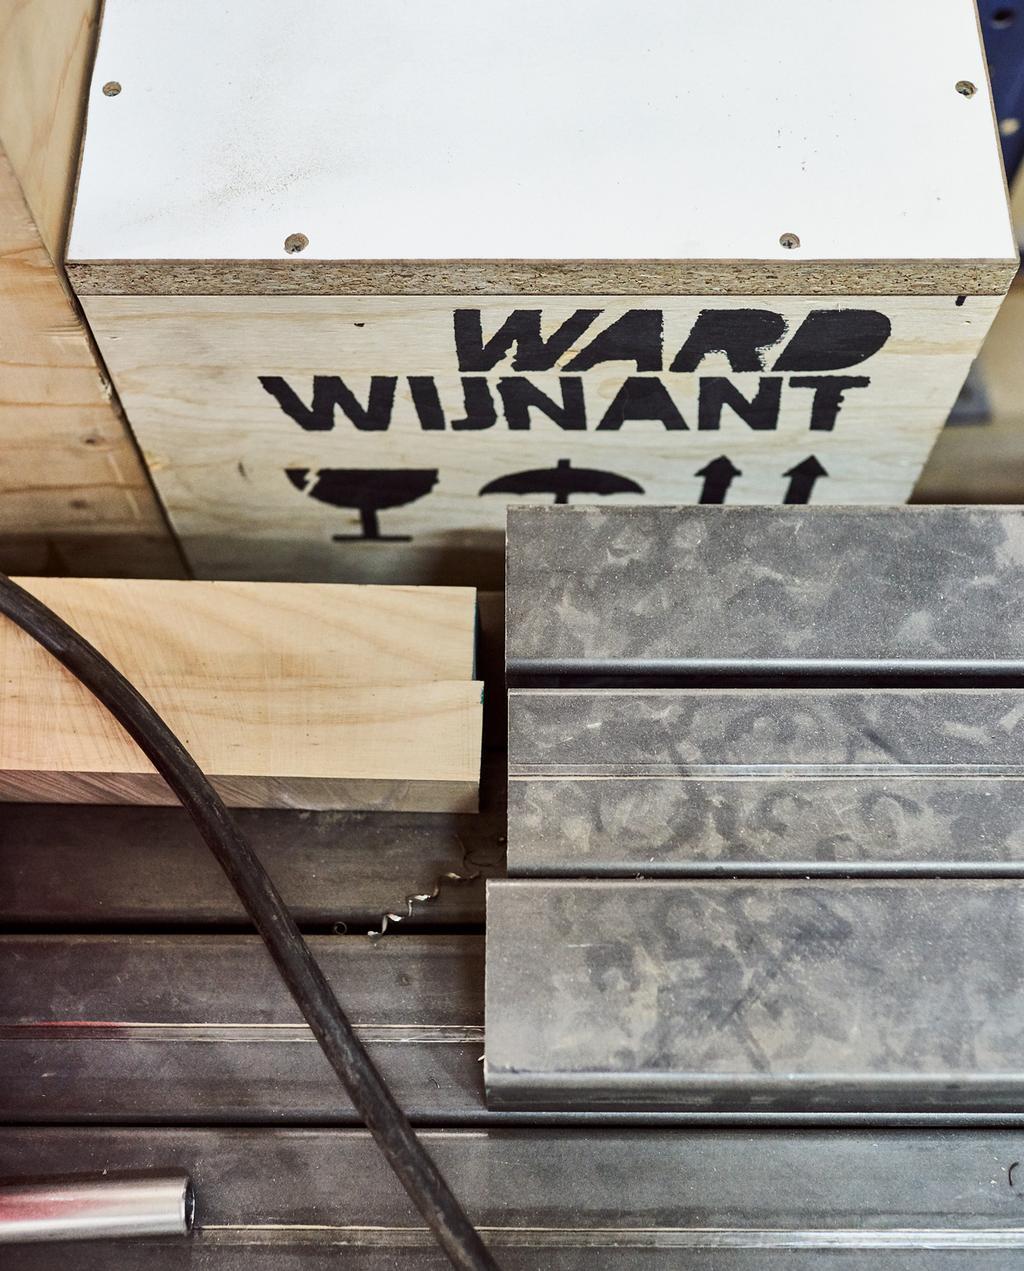 vtwonen 05-2020 | ambacht Ward Wijnant